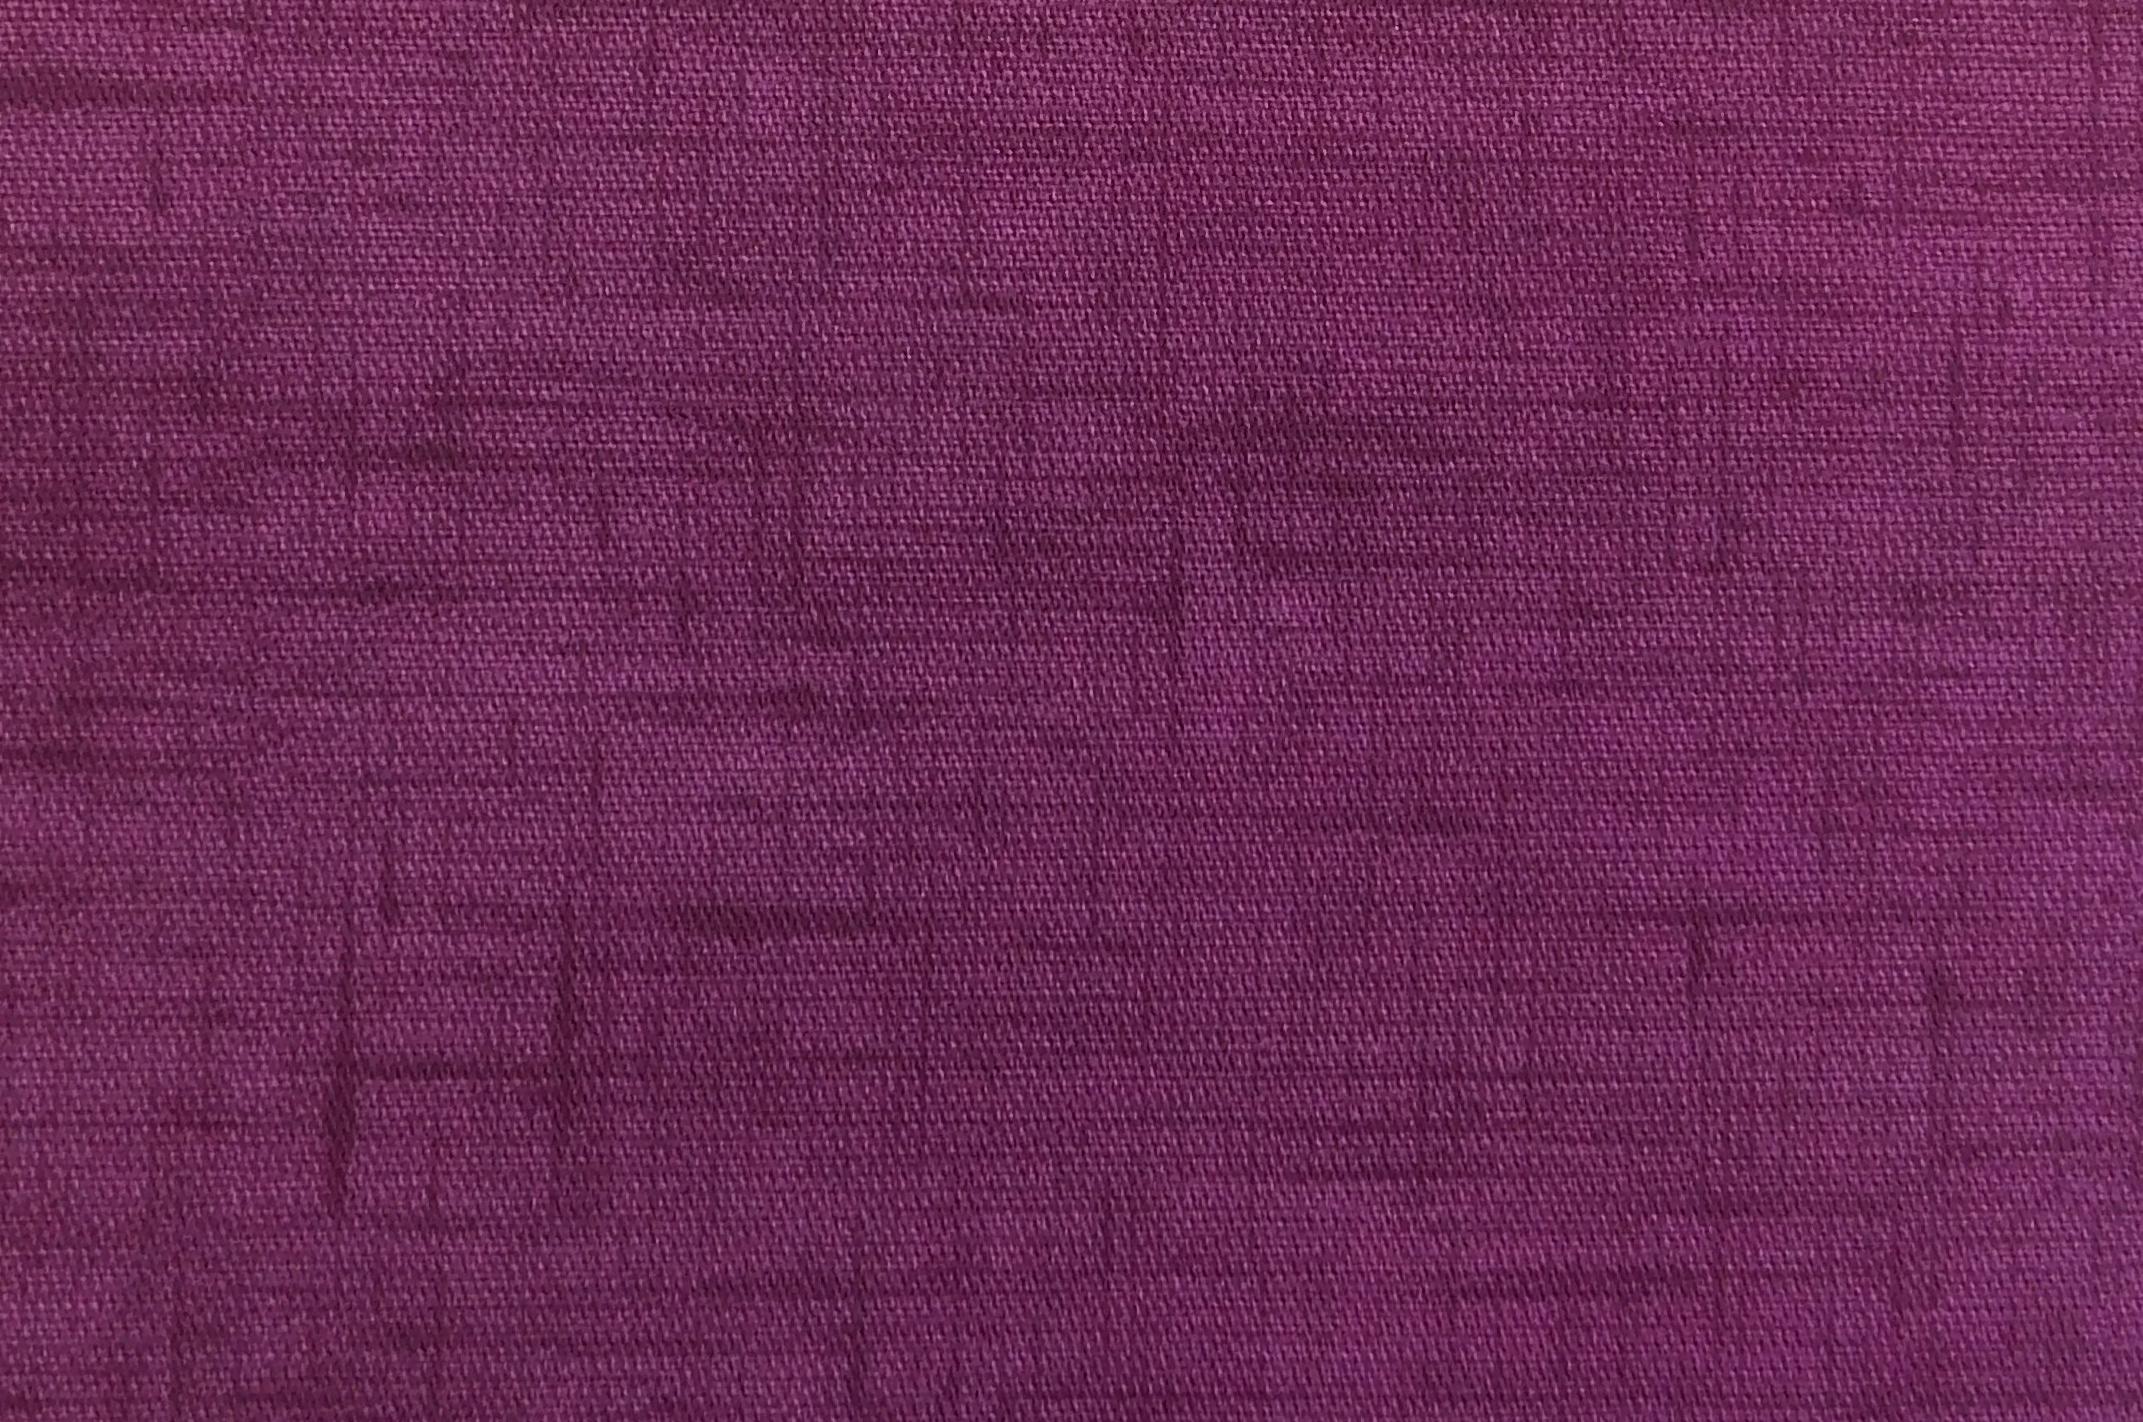 Spectrum Grape Blind Sample Fabric